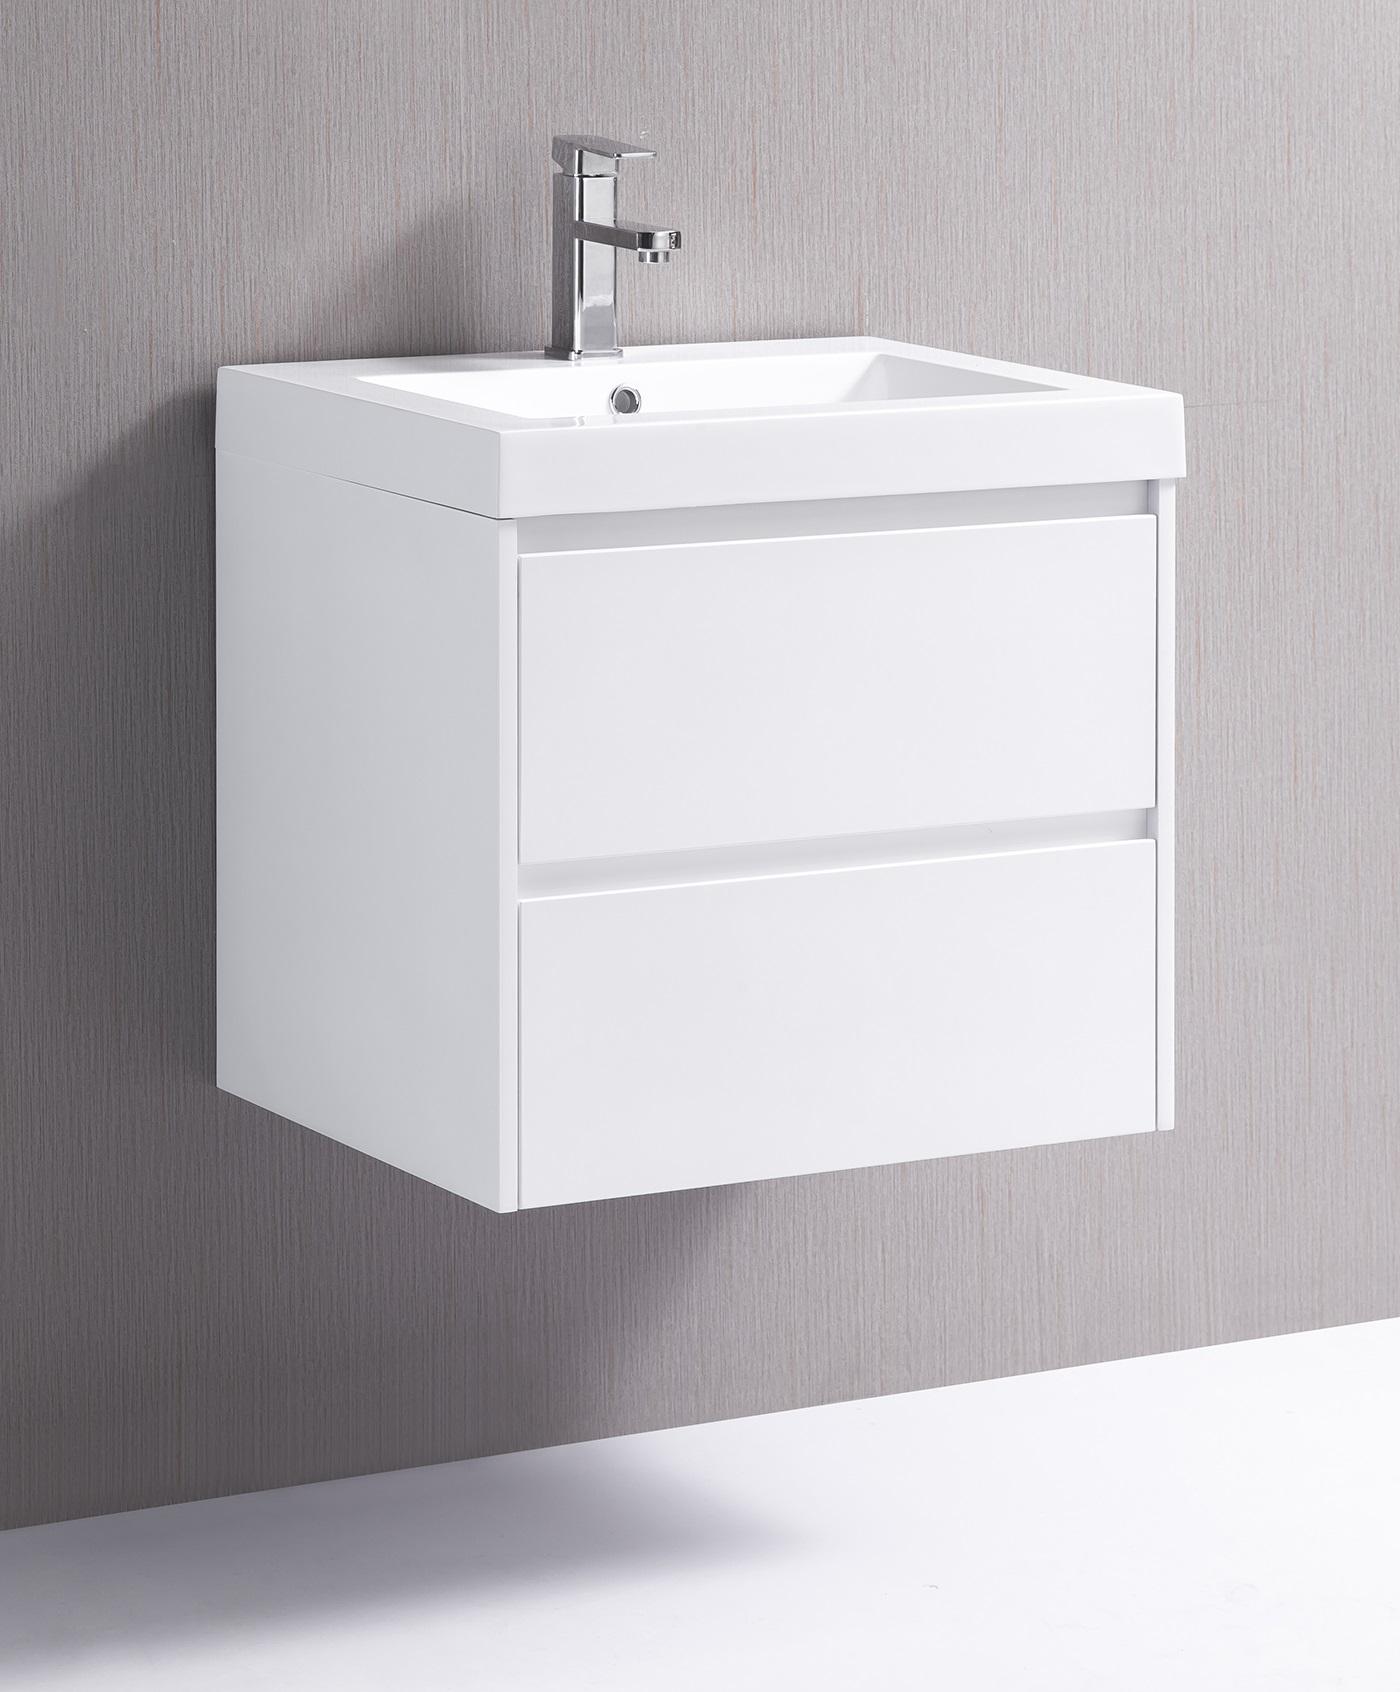 600mm Wall Hung Bathroom Vanity Unit With Polyurethane Finish, Poly Marble Basin - Della Francesca  Z2600